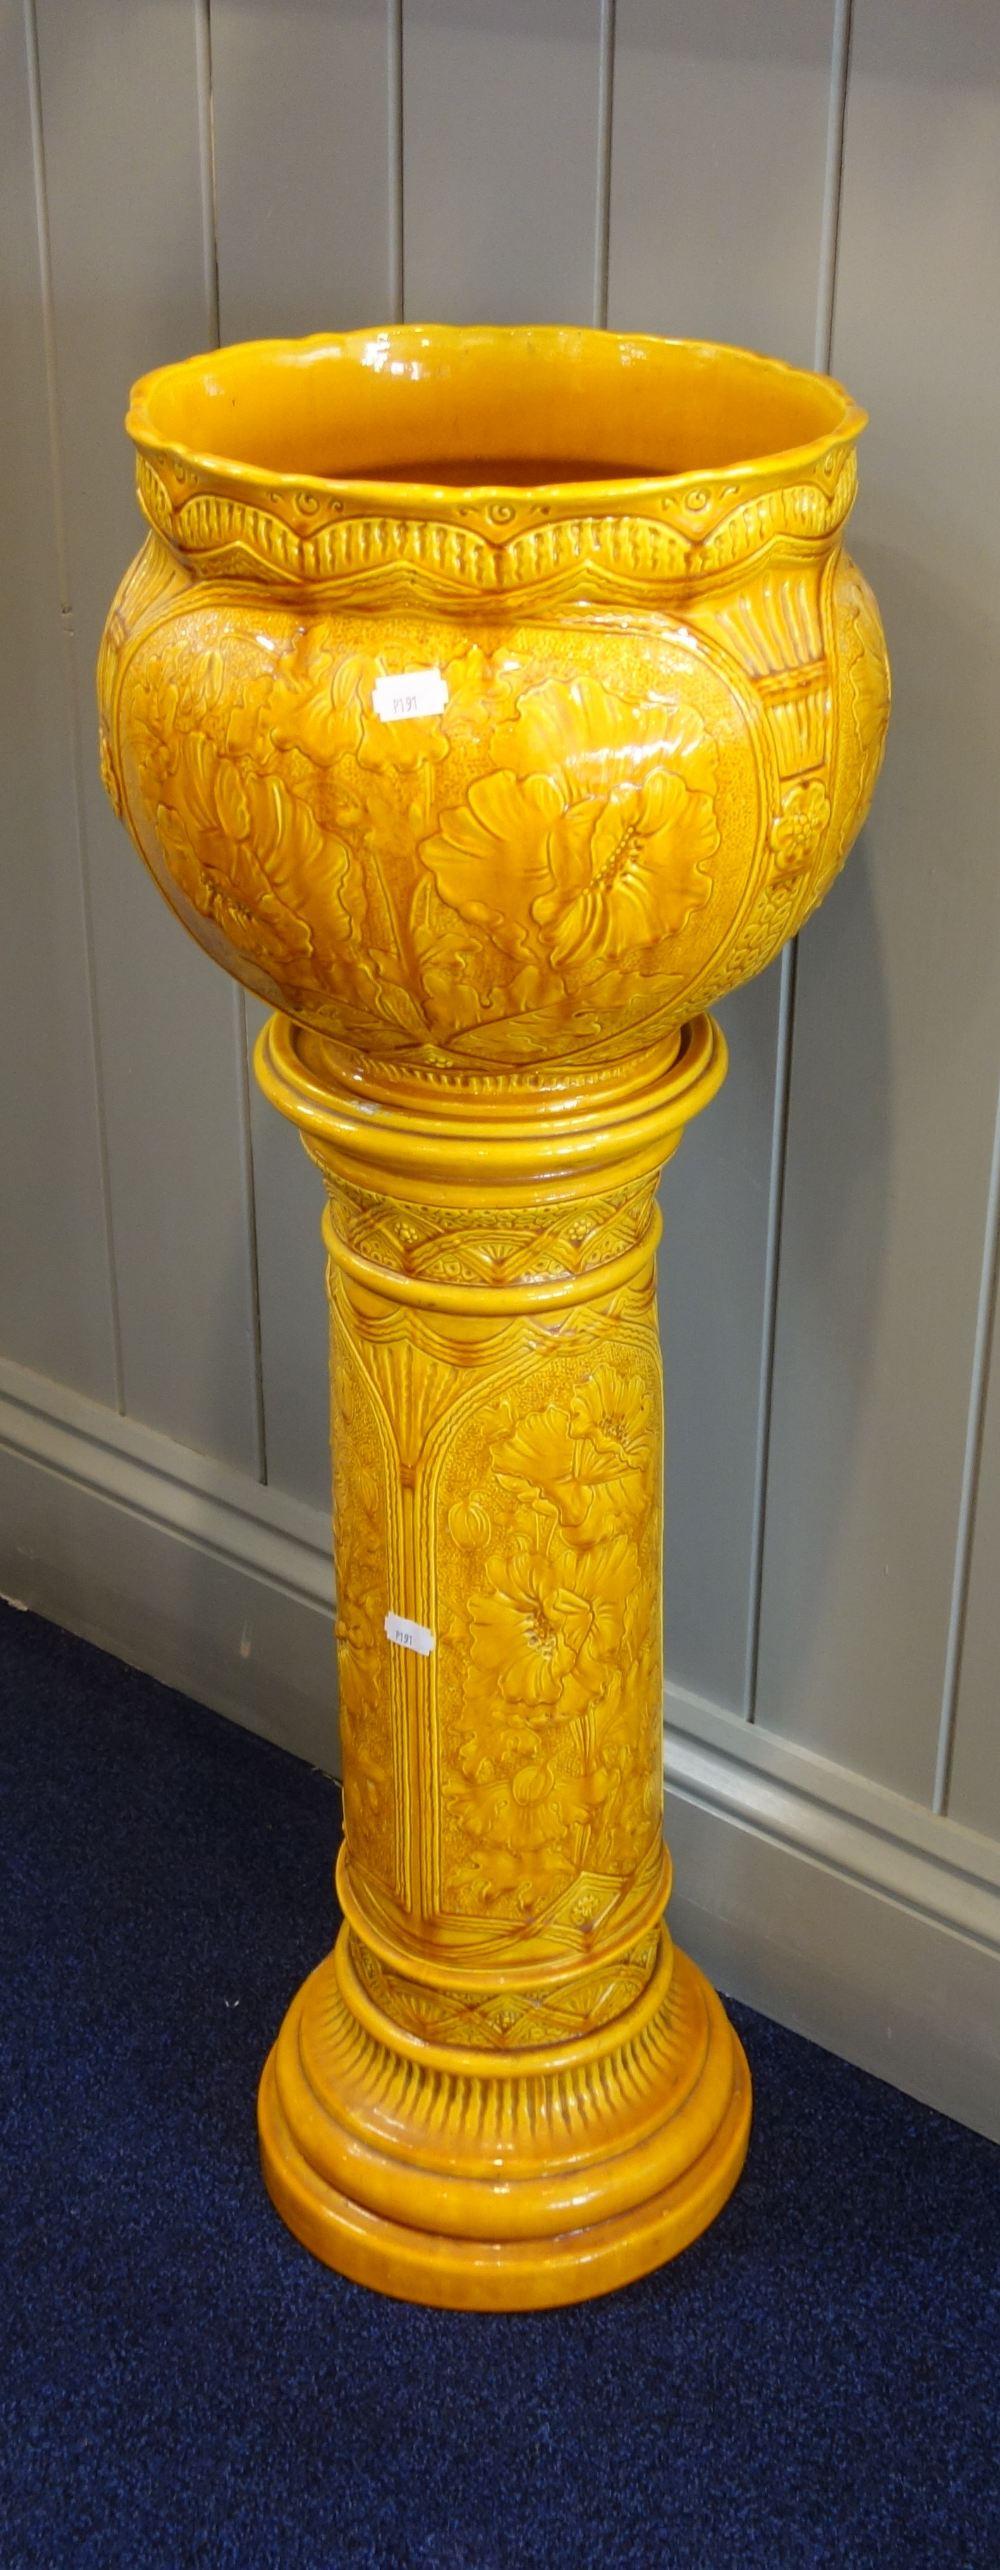 Lot 12 - A BURMANTOFT'S FAIENCE ORANGE GLAZED JARDINIERE ON STAND, 85cm high (overall)